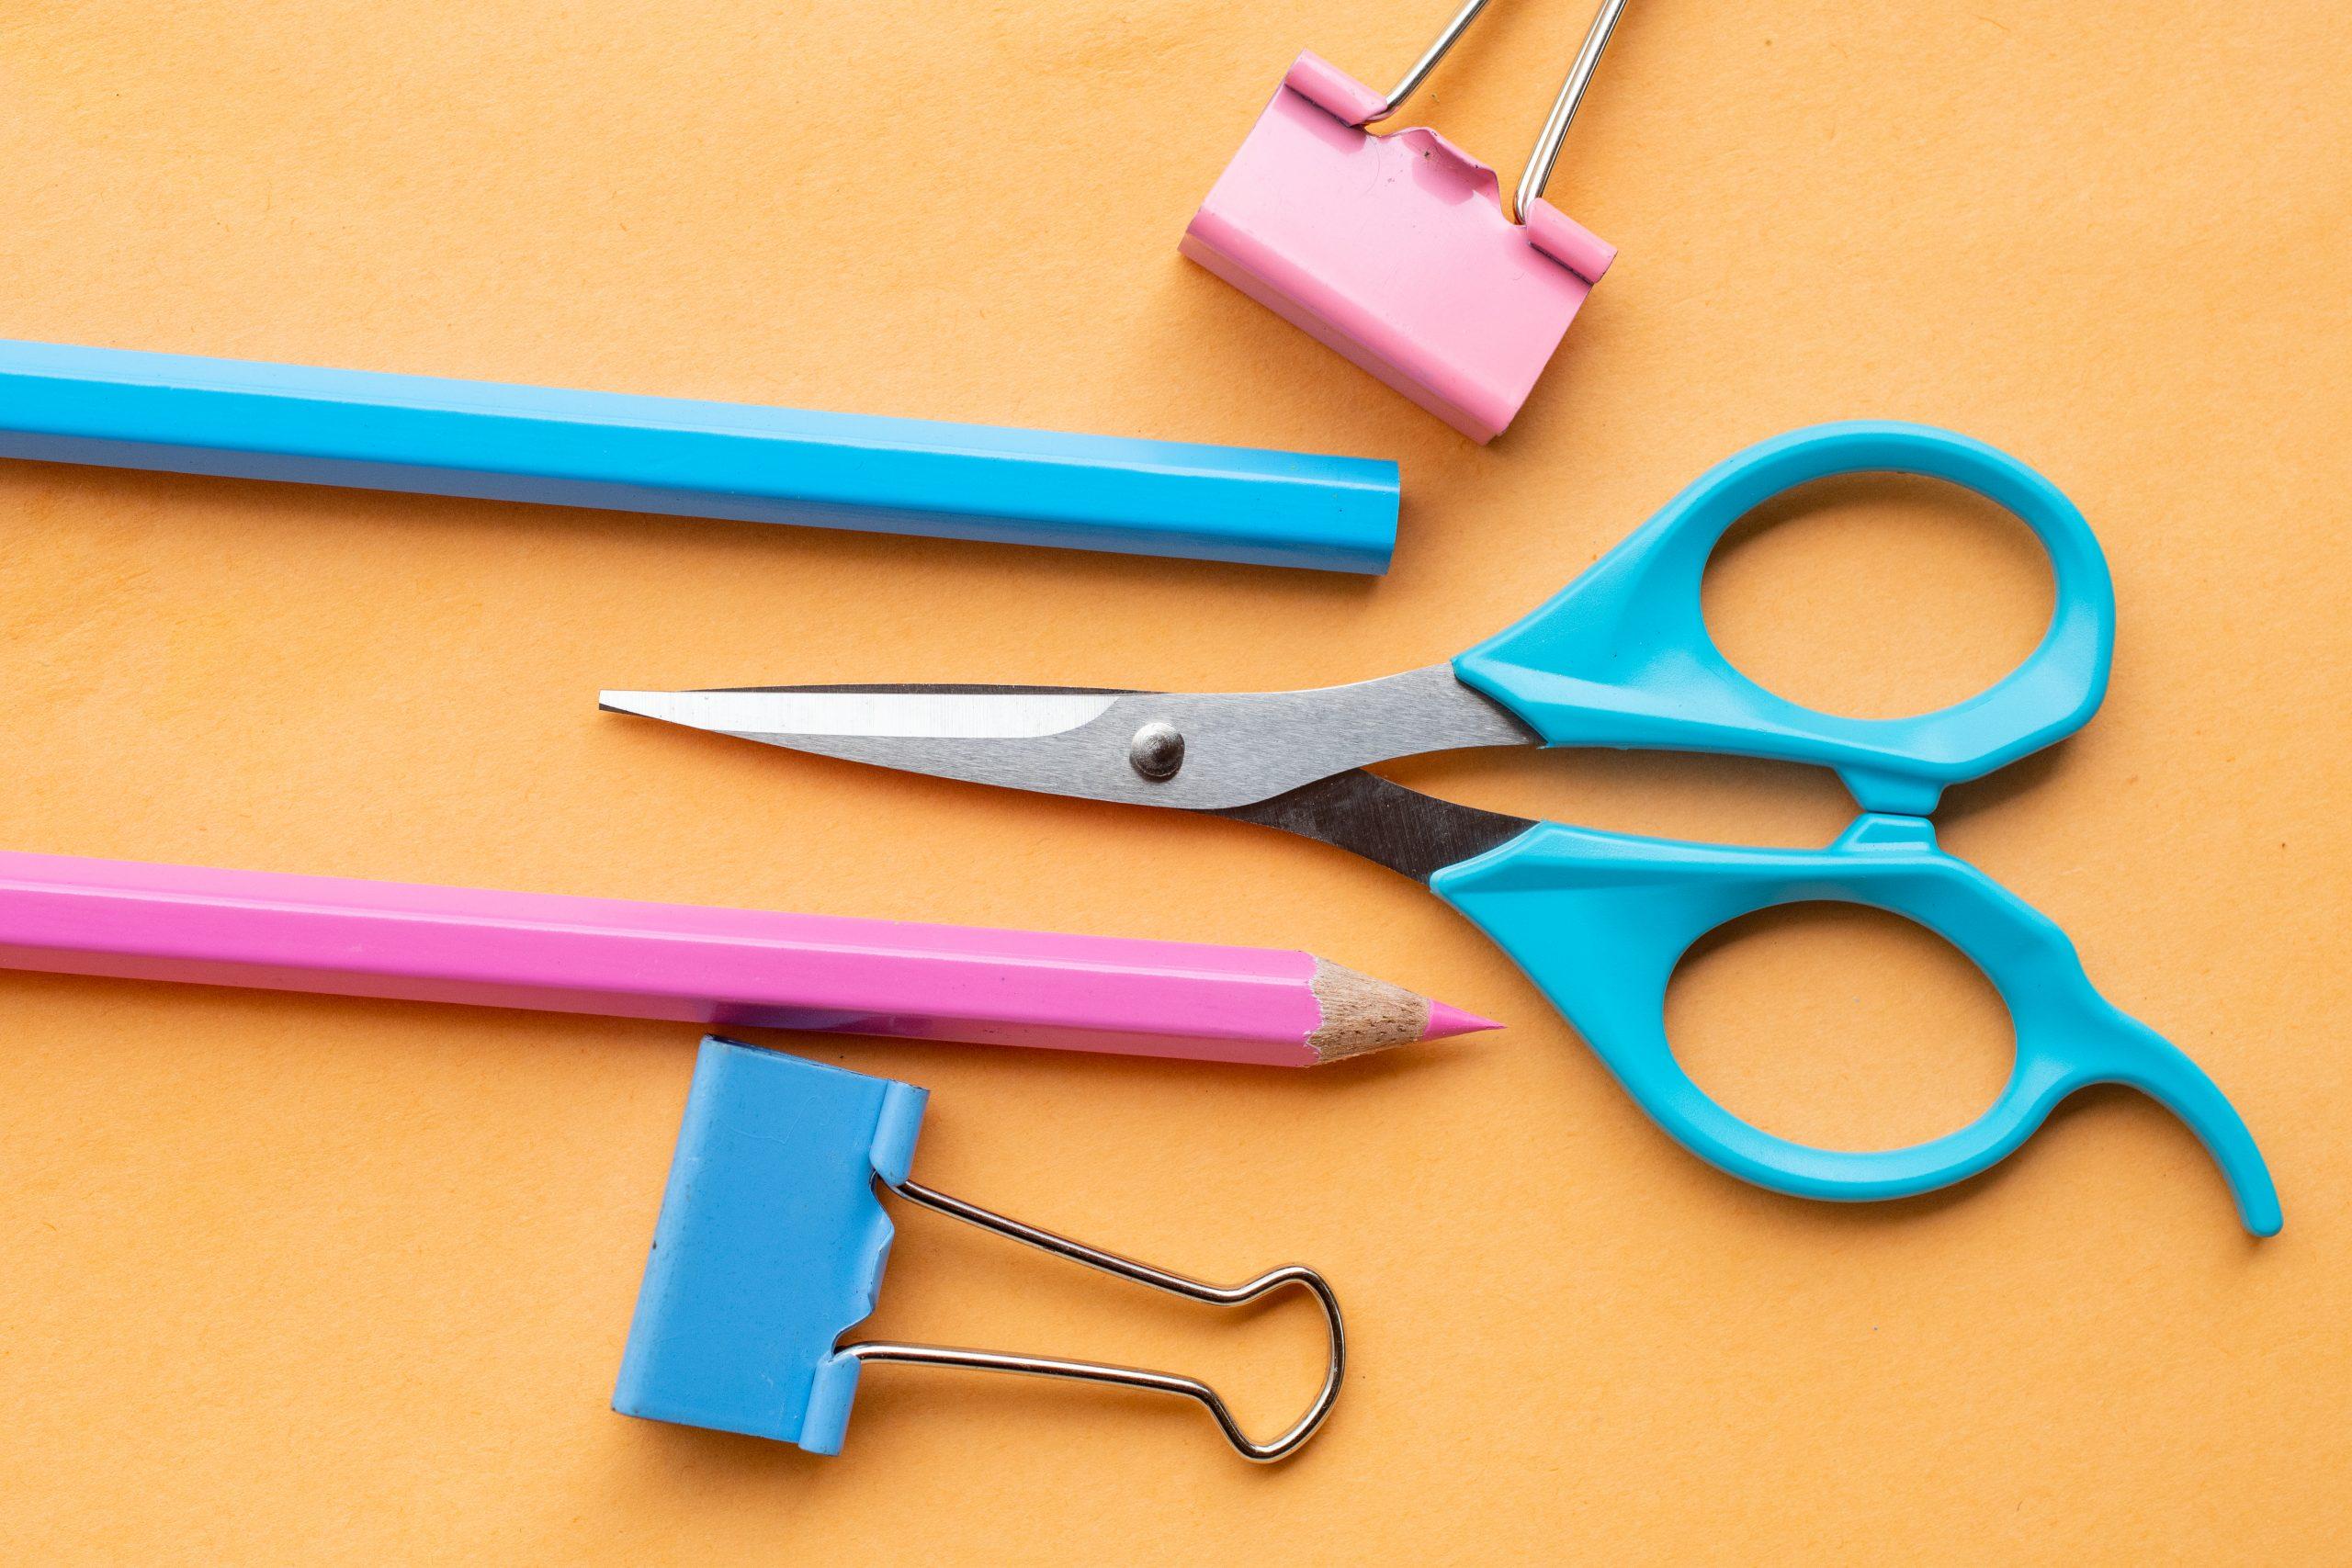 pencil colors, scissors, paper clips